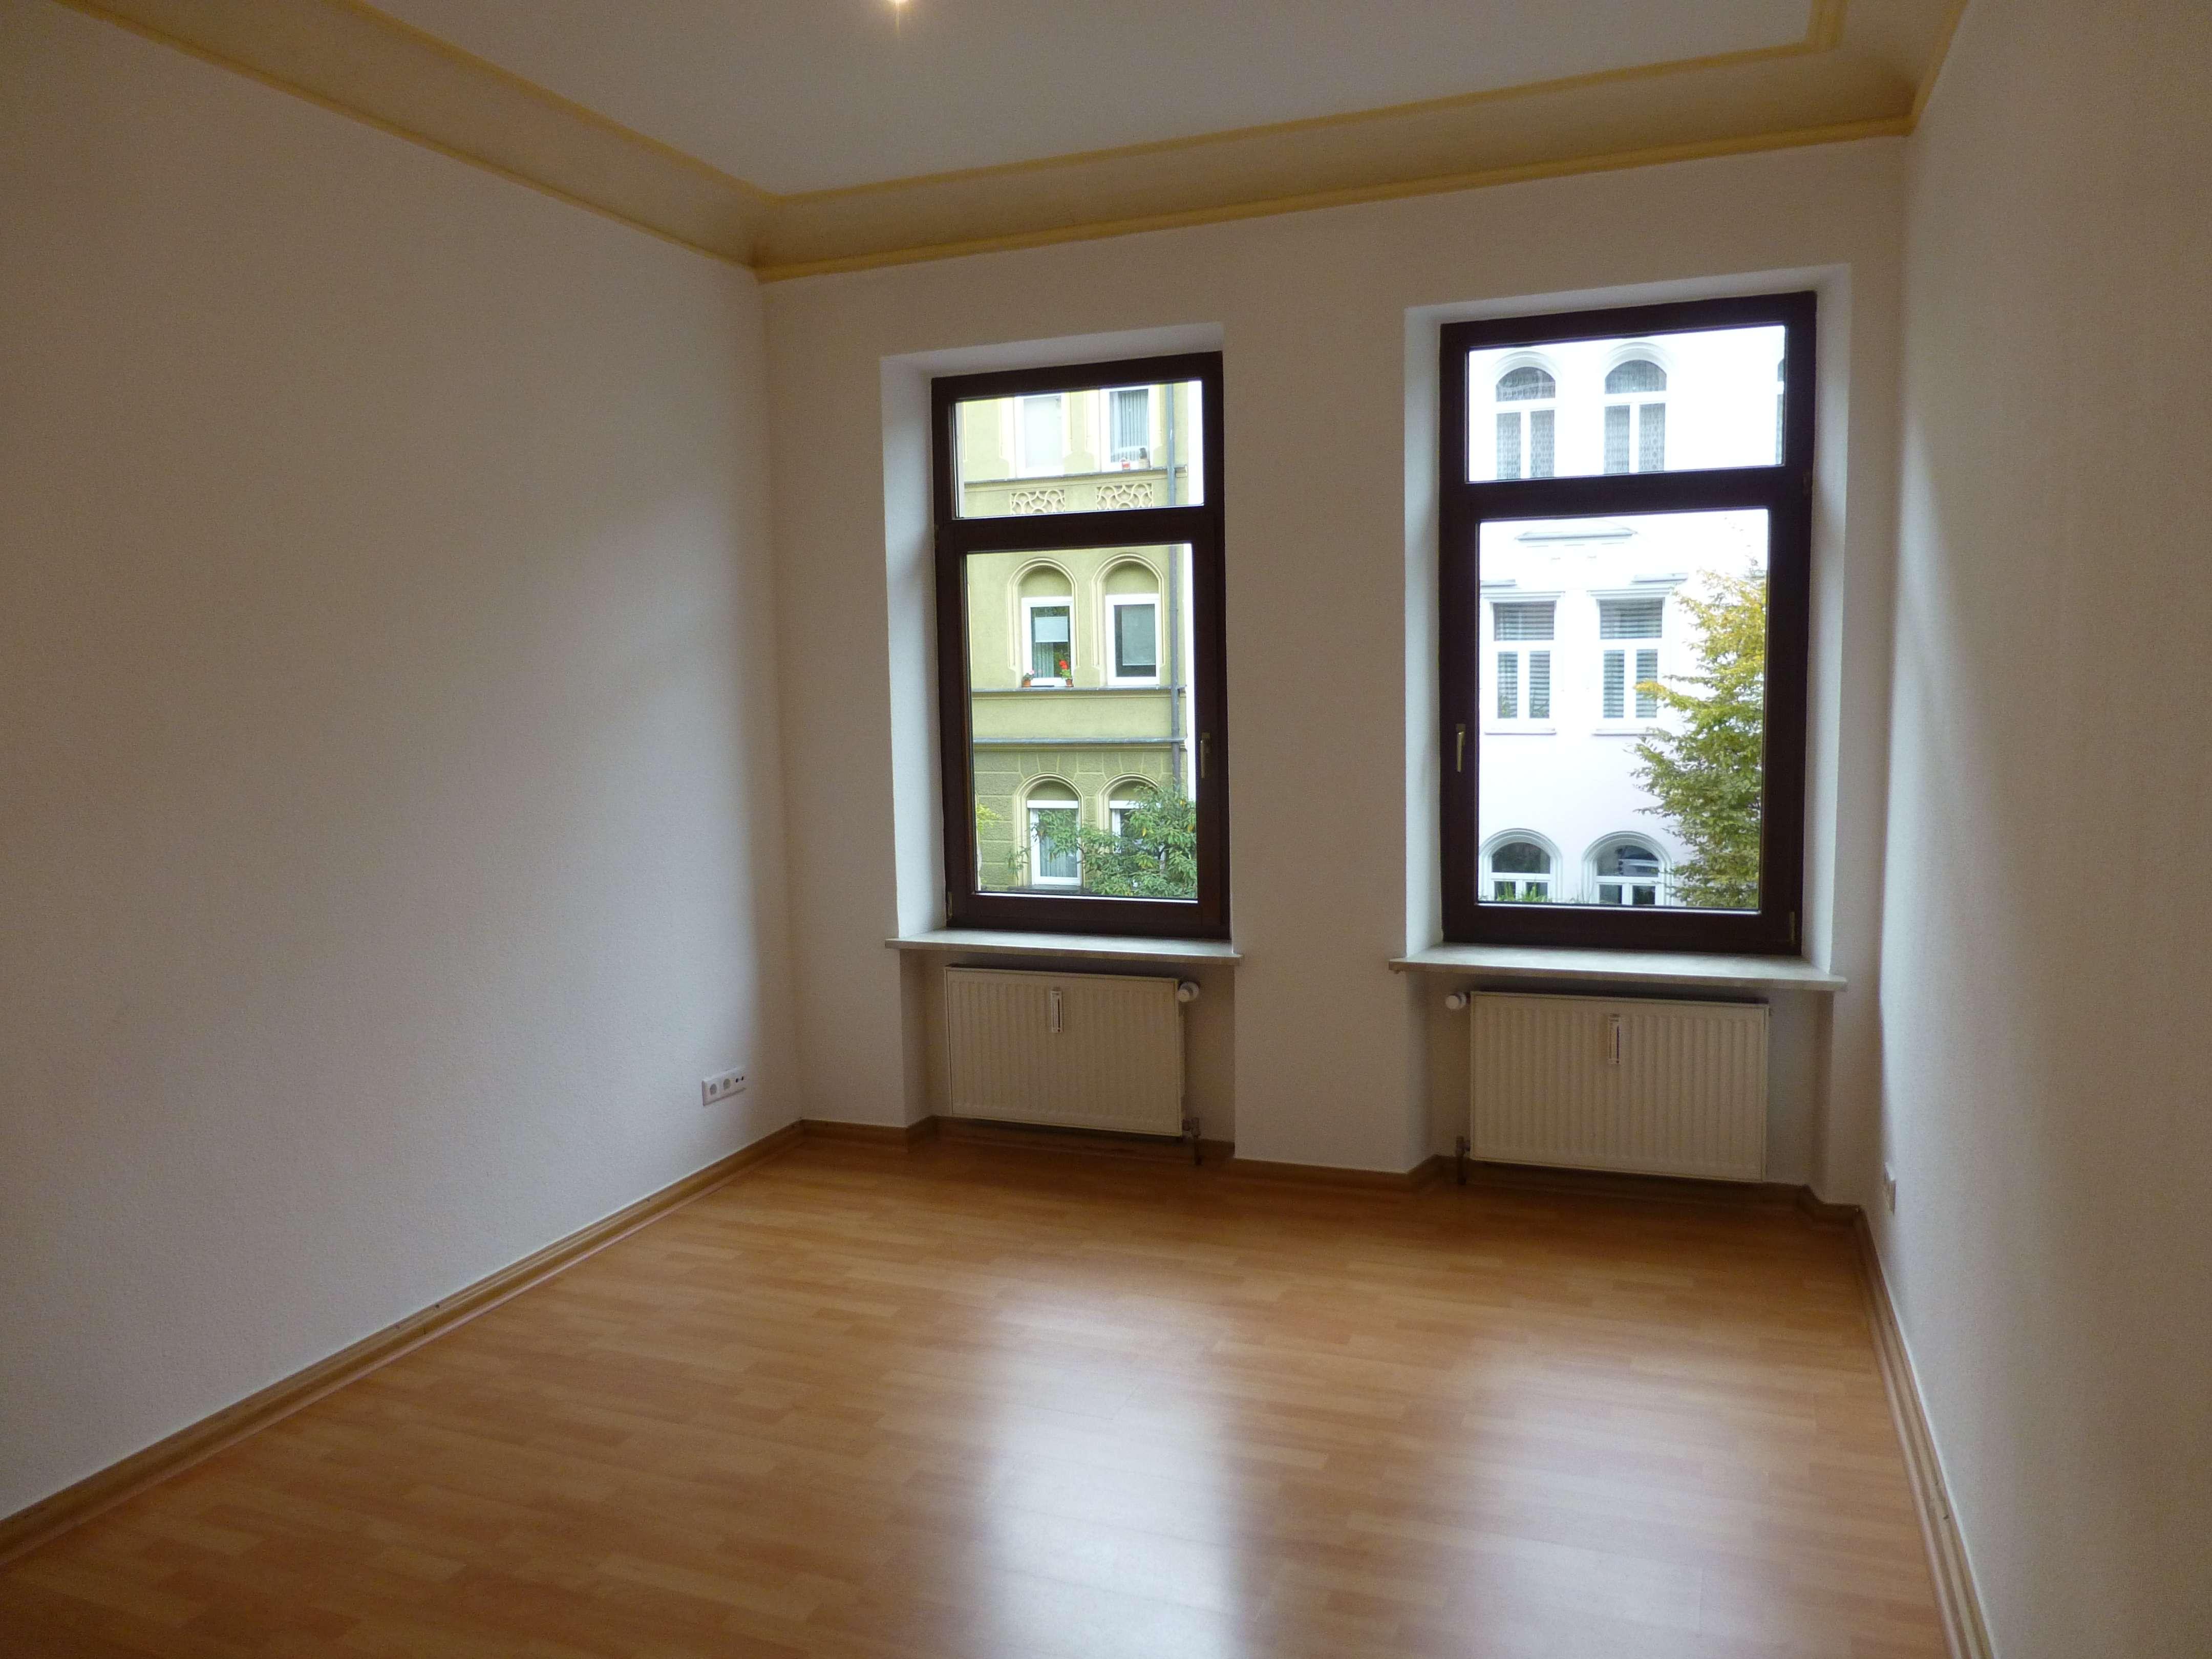 Top sanierte 4-Zimmer Jugendstilwohnung, Nürnberg Rosenau